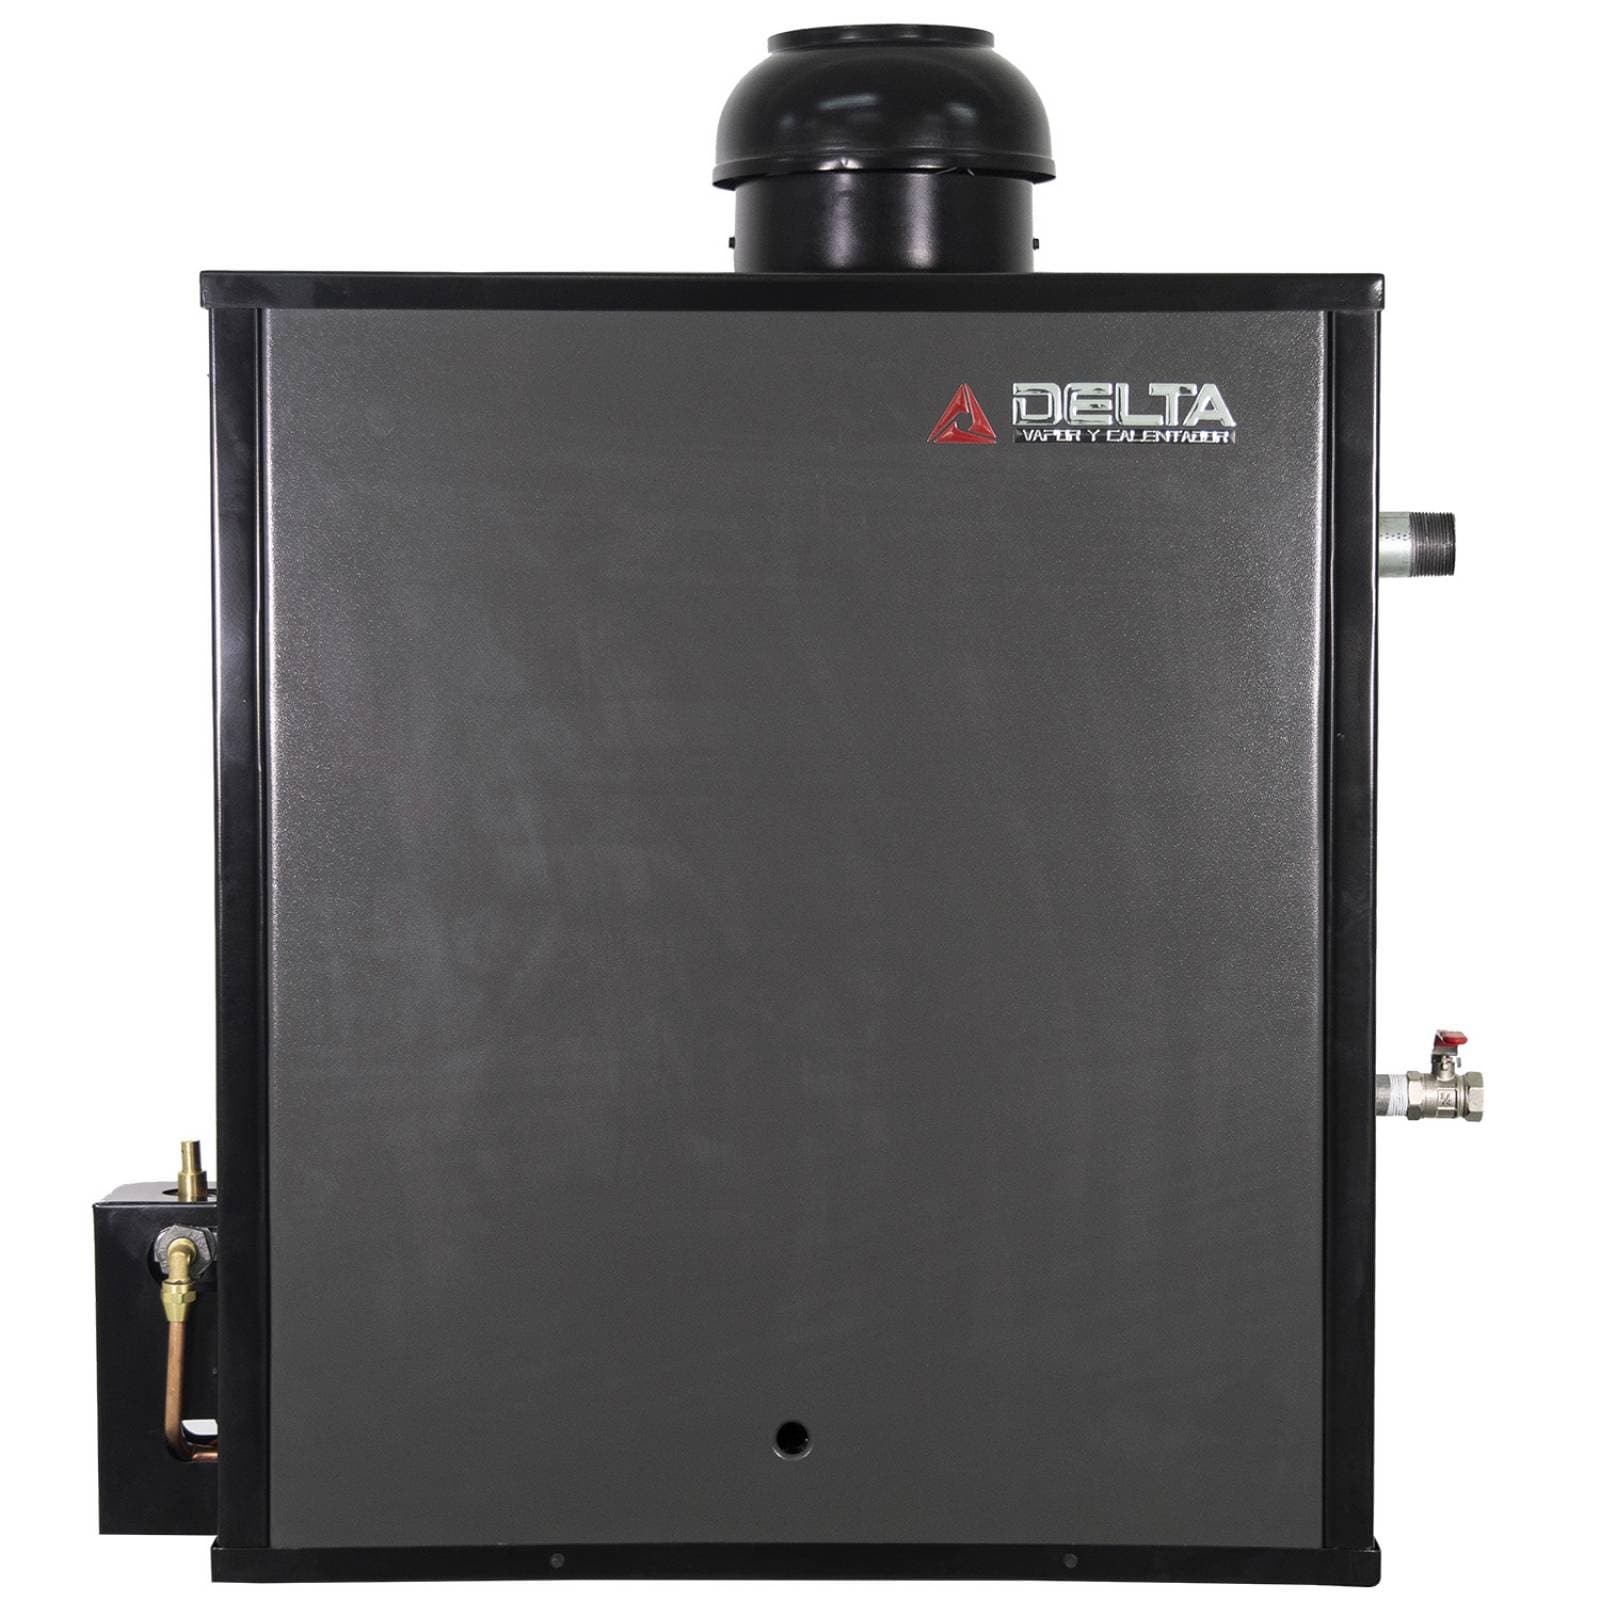 Generador de Vapor Diseñado para Hogar o Spa Instalación en Espacios de 20 m. Cúbicos Gas Natural Delta